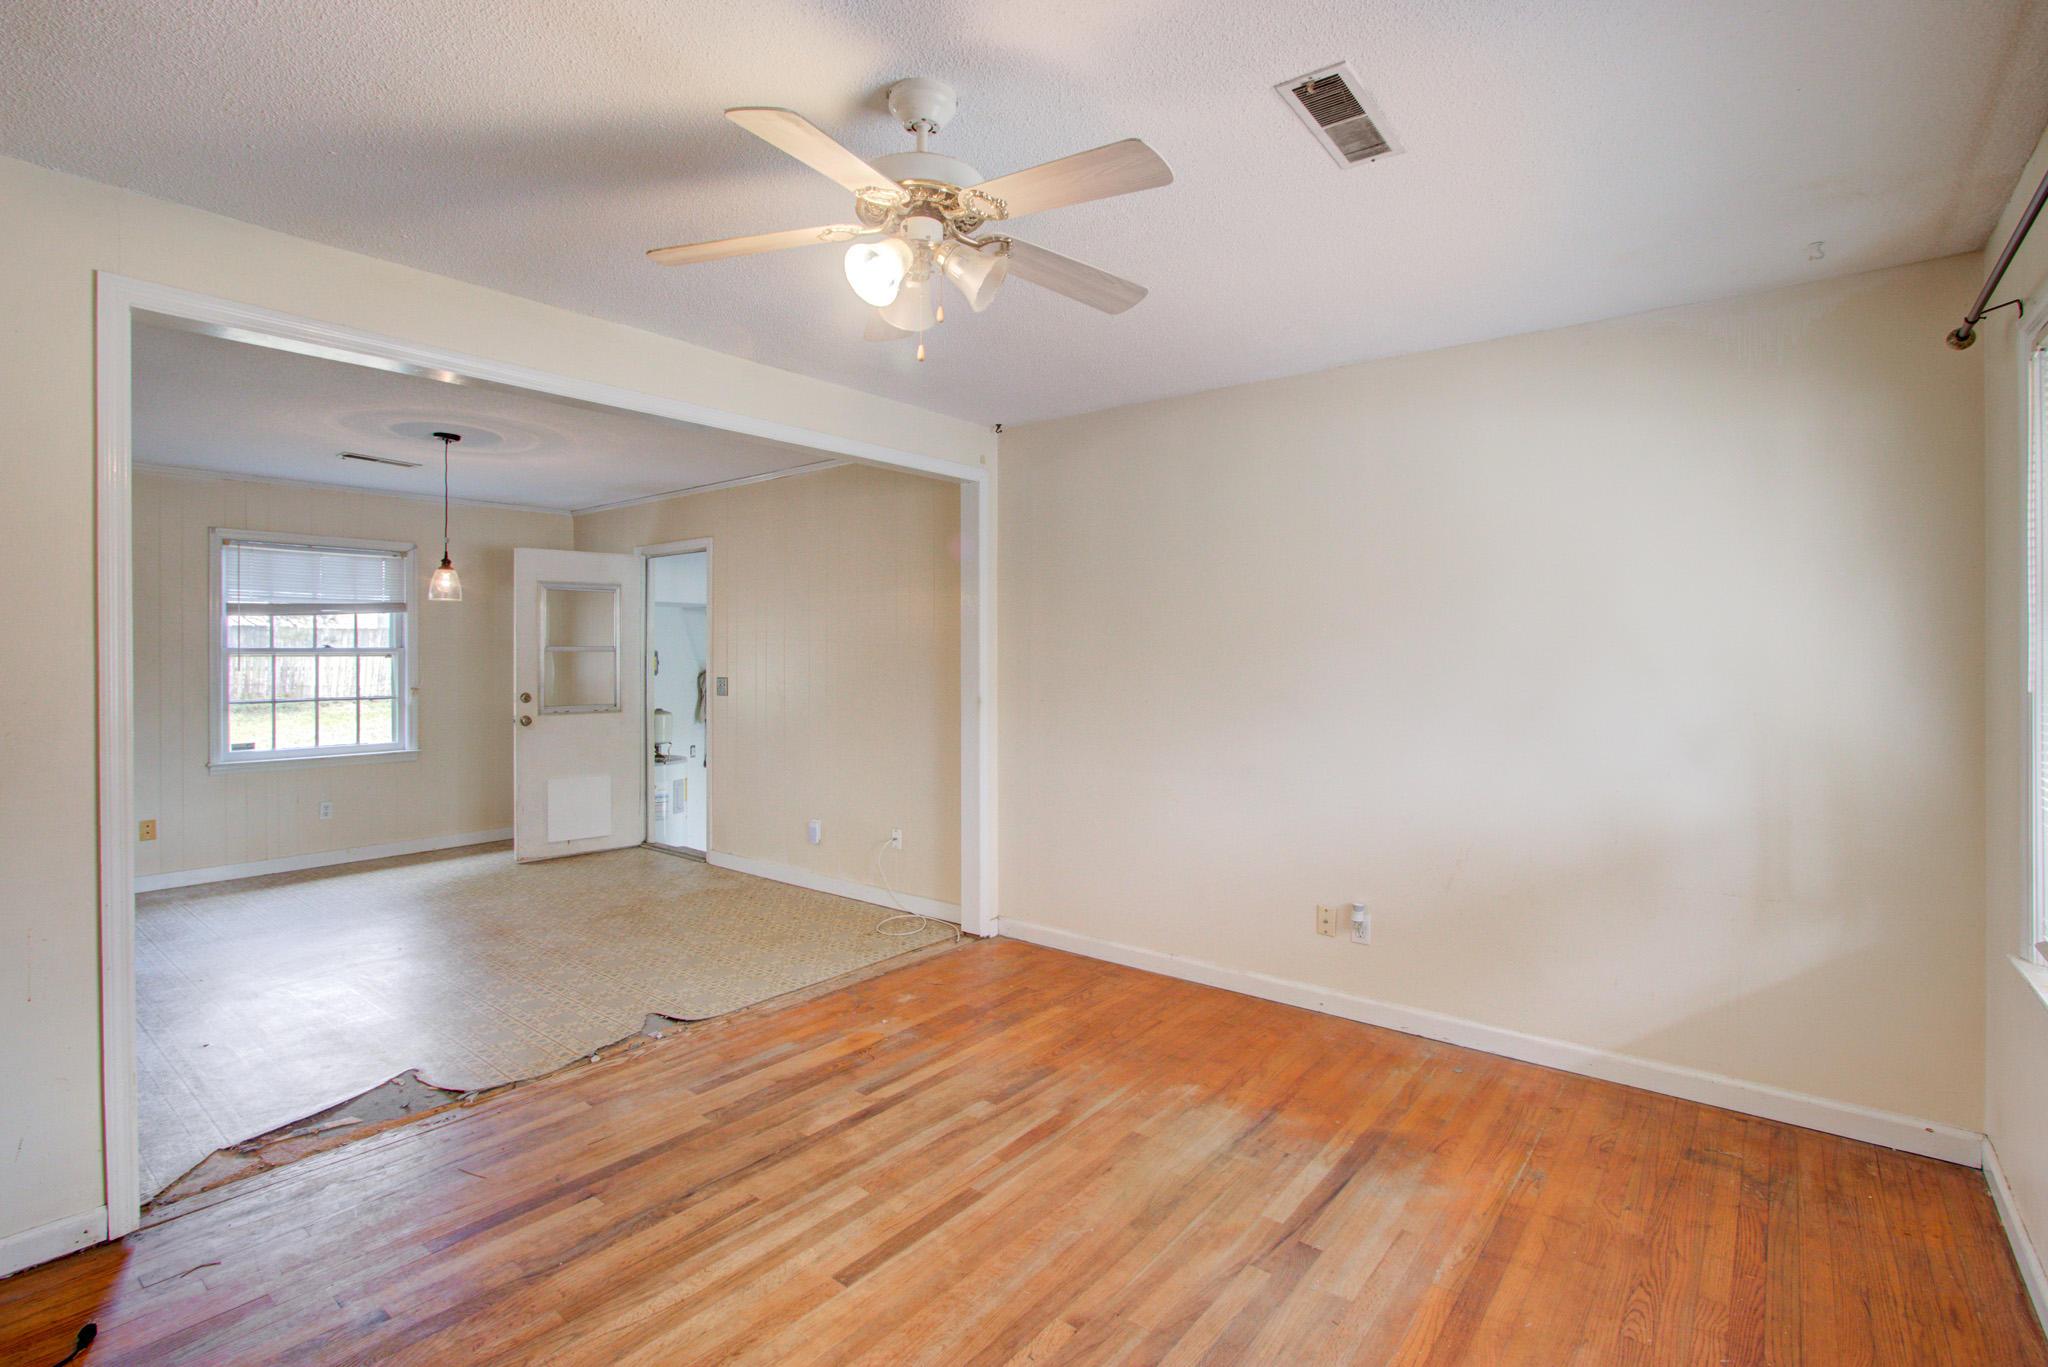 Bushy Park Terrace Homes For Sale - 125 Azalea, Goose Creek, SC - 12